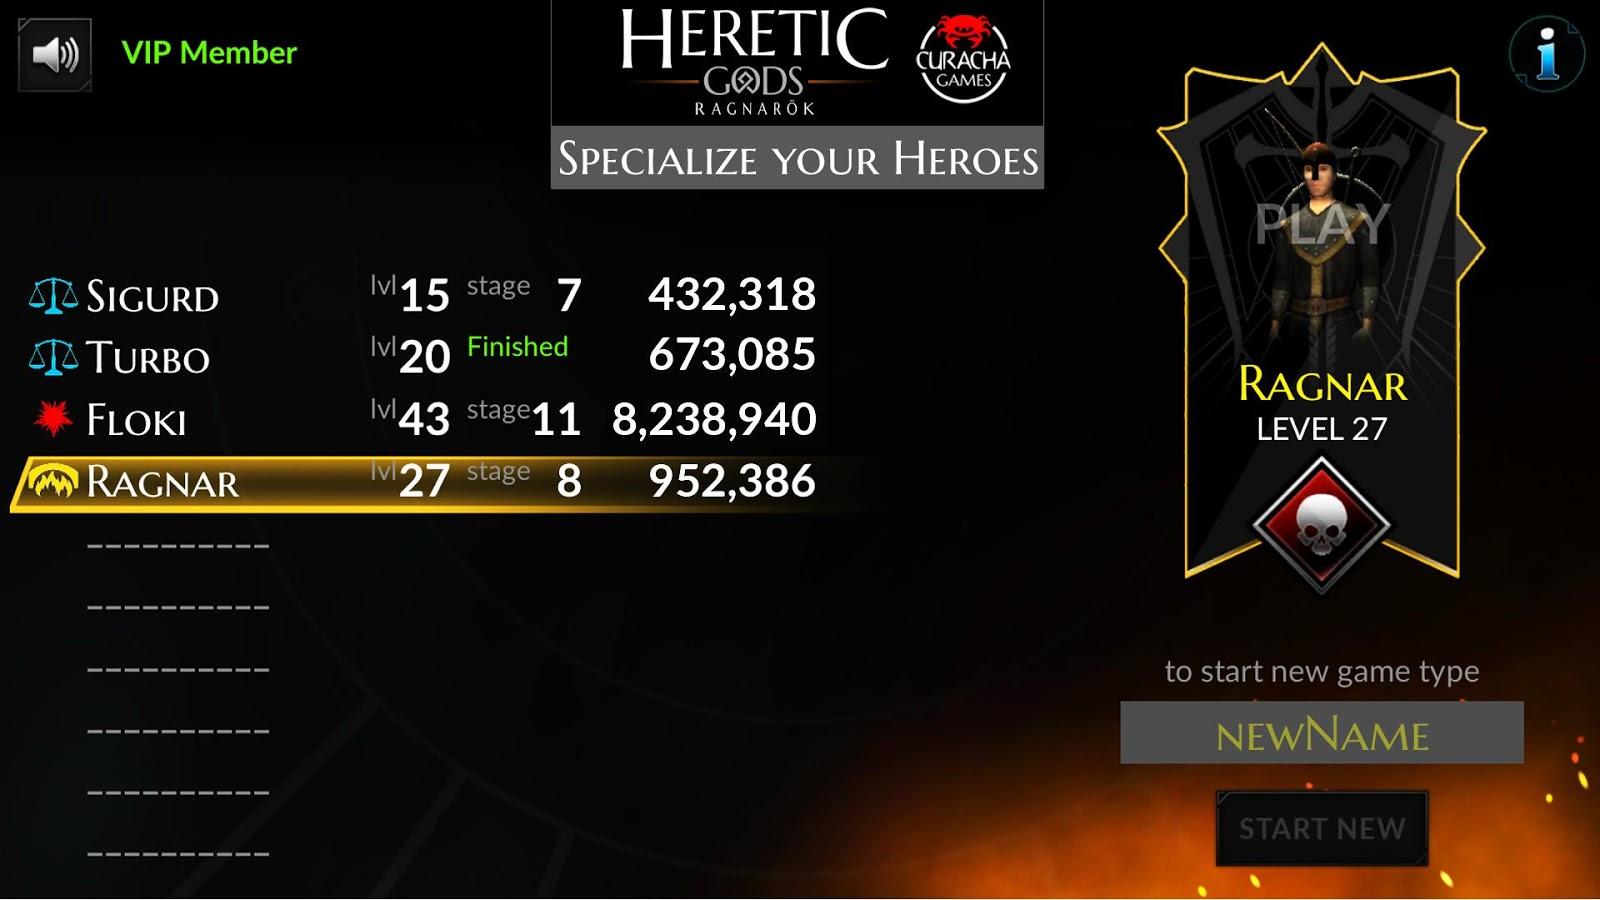 HERETIC GODS - Ragnarök新手攻略大全 新手怎么玩